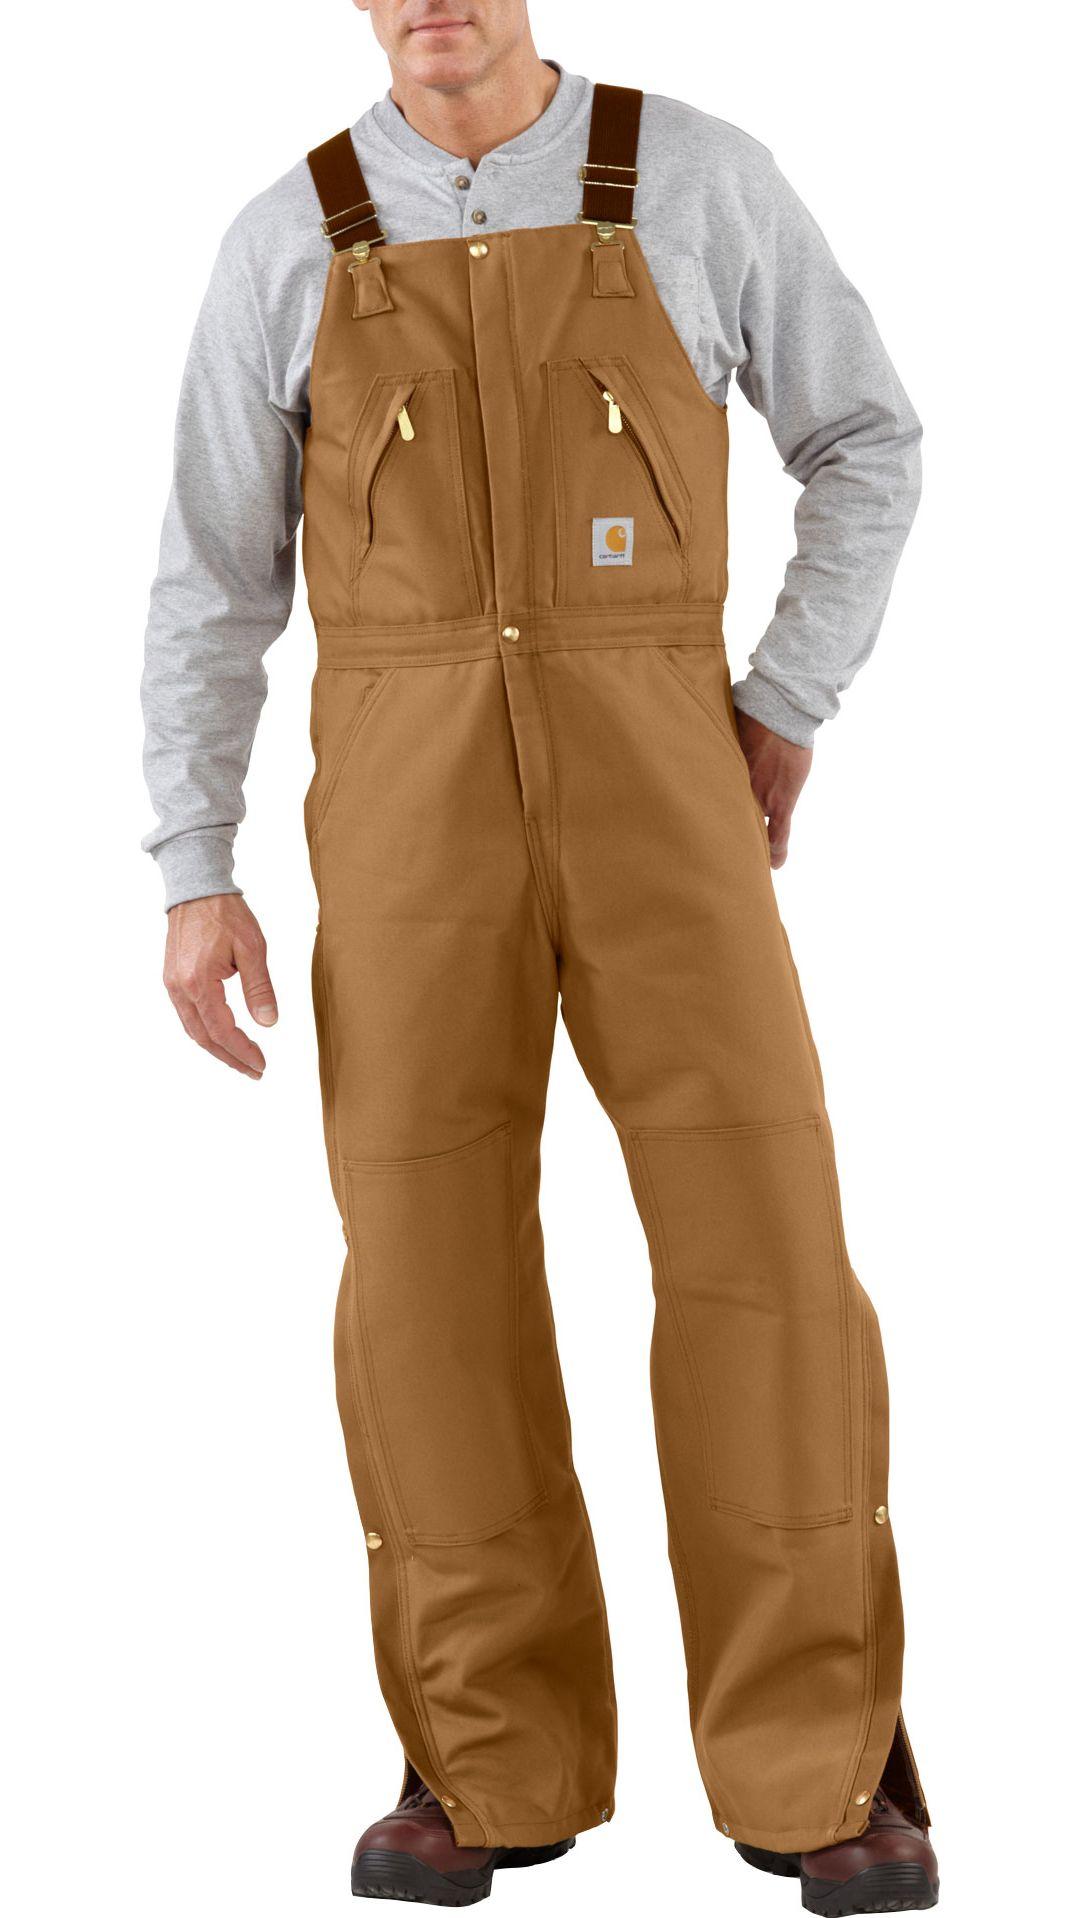 various styles lowest price amazing price Carhartt Men's Zip-To-Waist Quilt Lined Duck Bibs